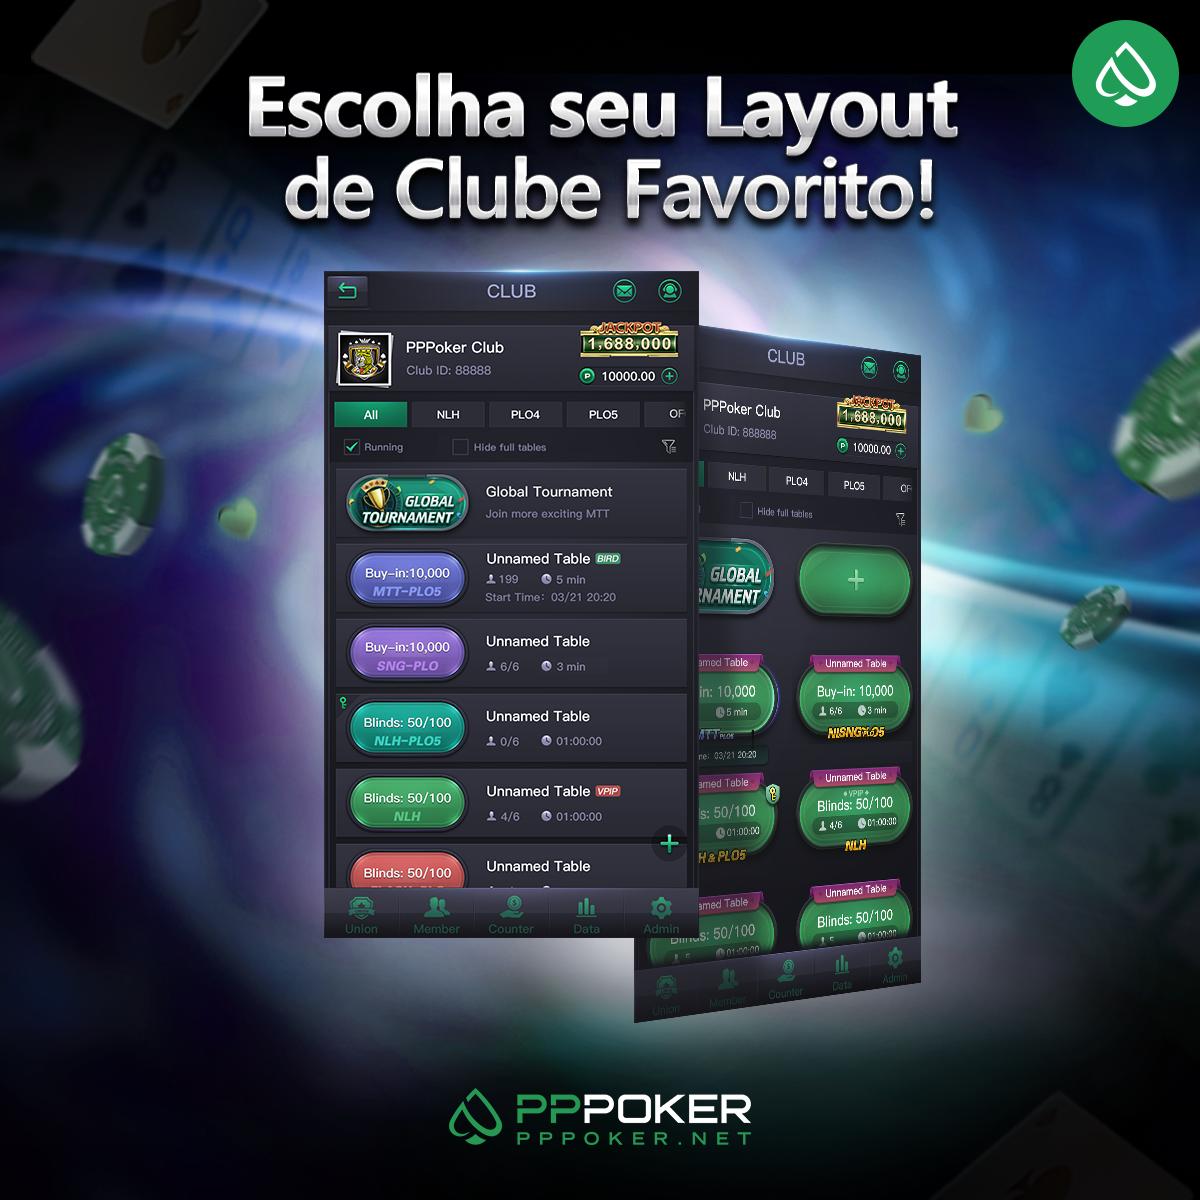 Nova interface de clubes do PPPoker